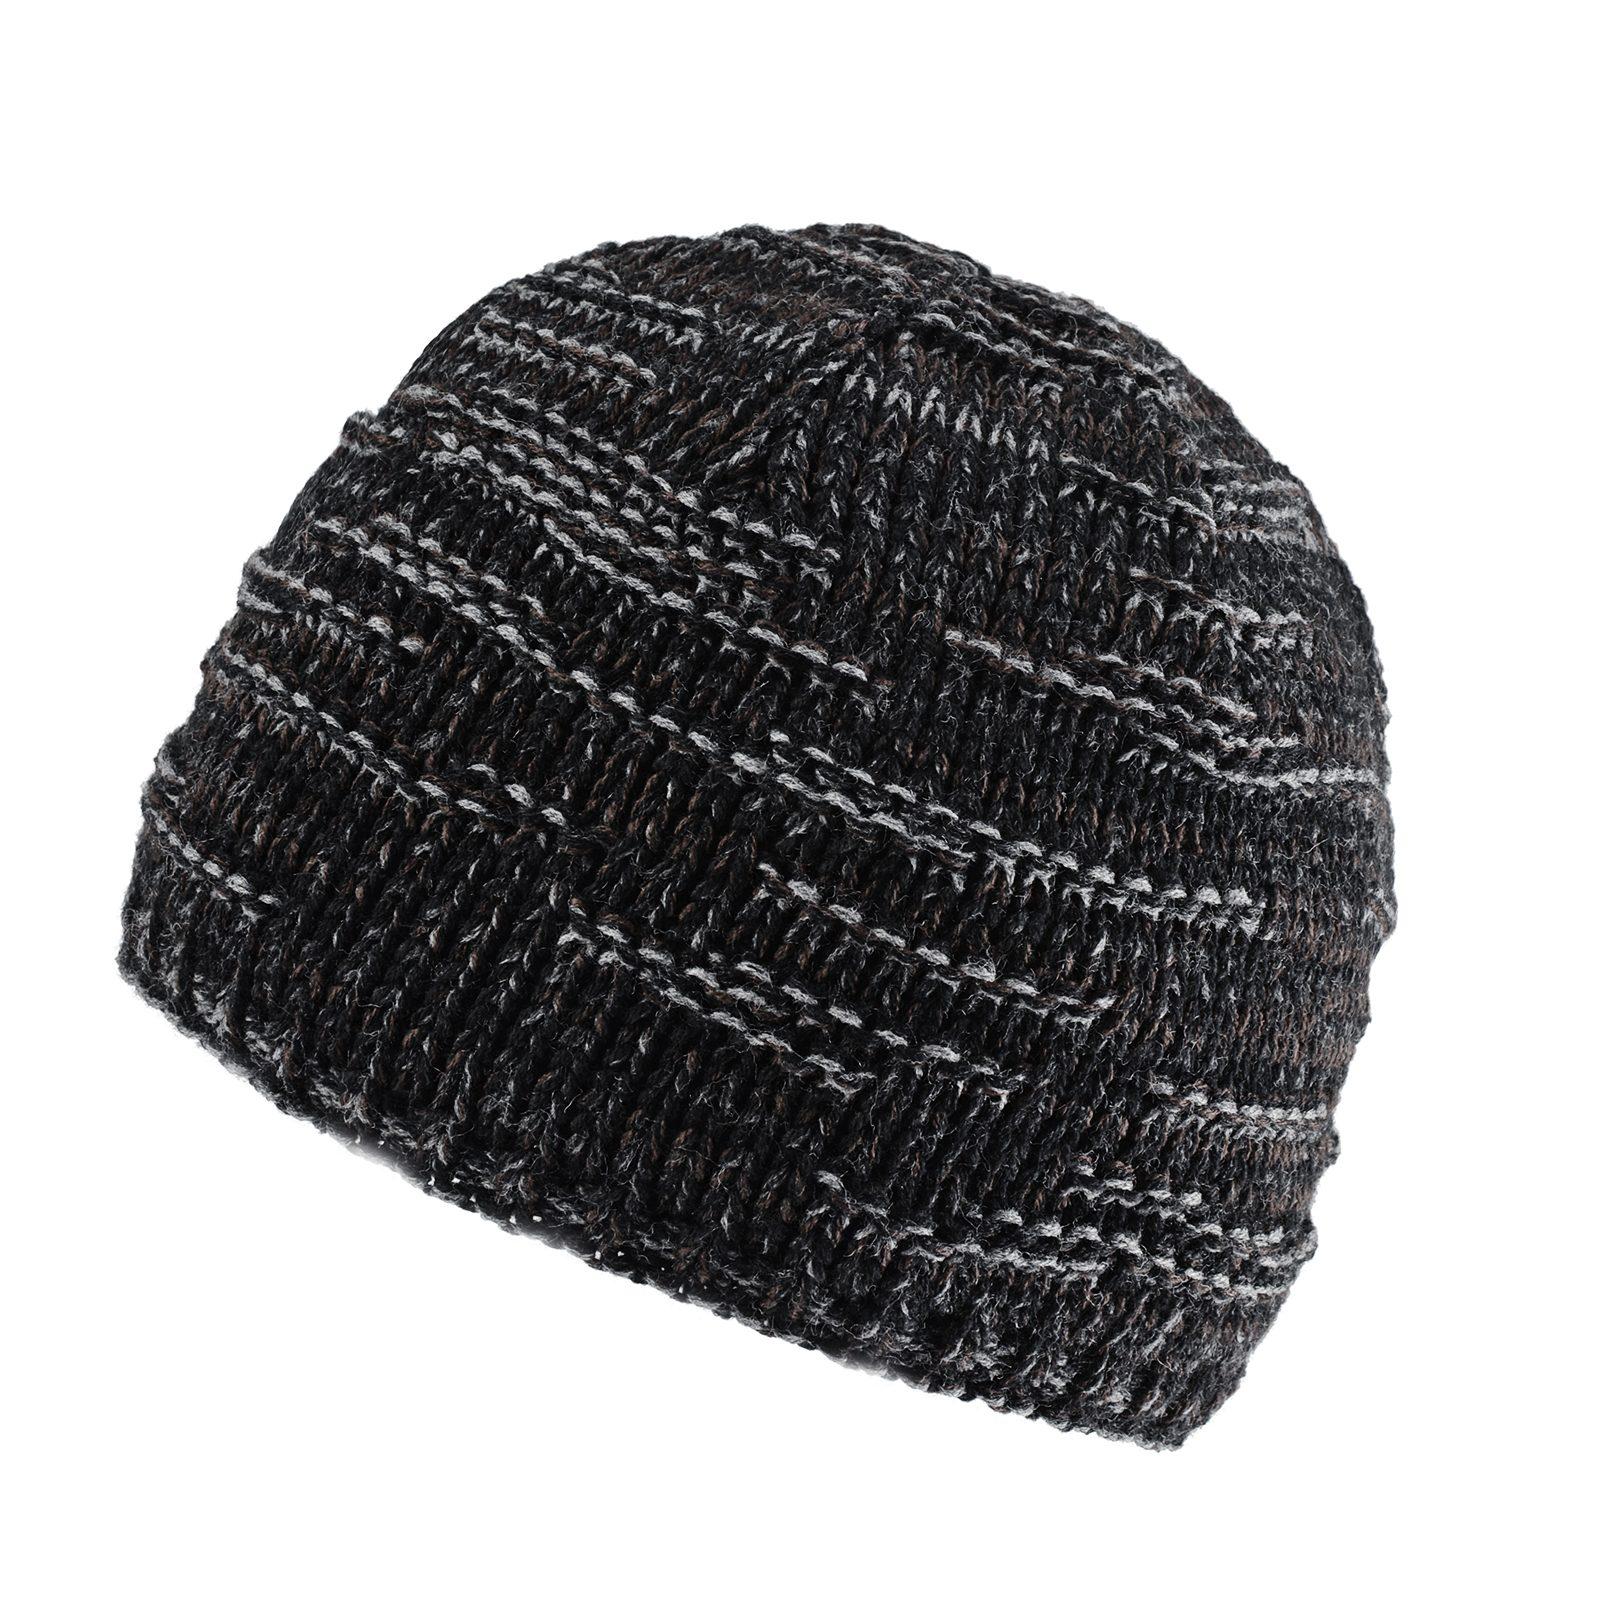 http://lookbook.allee-du-foulard.fr/wp-content/uploads/2018/11/CP-00771-F16-bonnet-court-homme-sombre-1600x1600.jpg